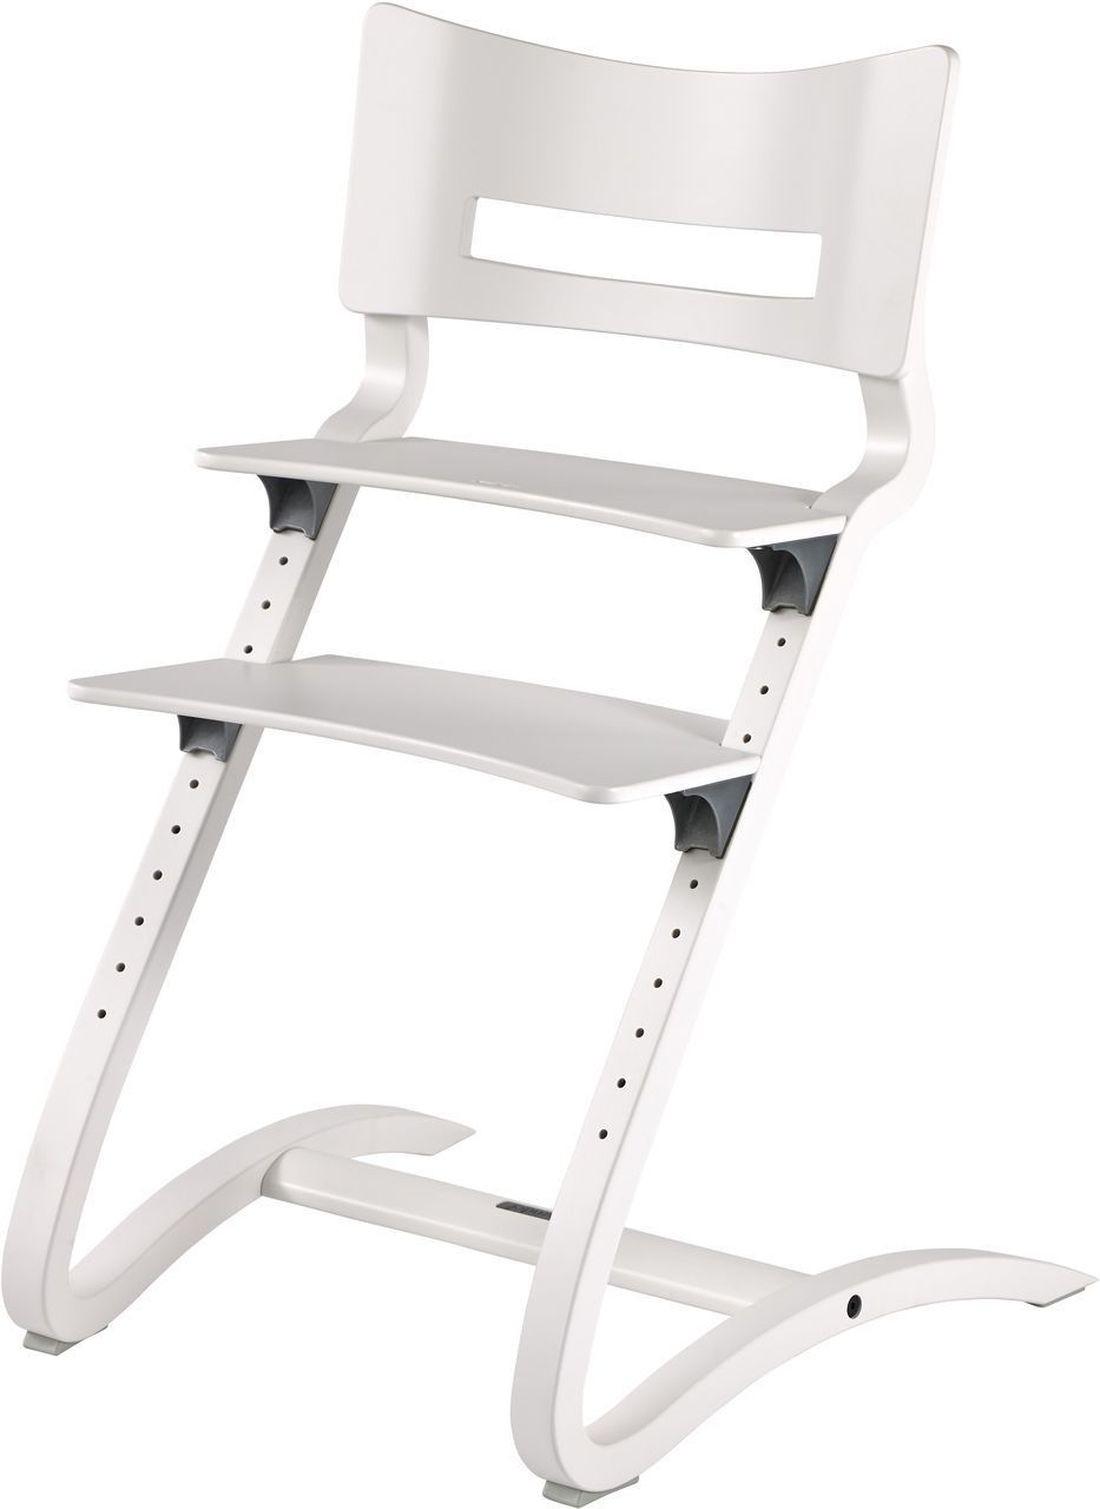 leander hochstuhl wei leander hochstuhl hochst hle essen stillen baby kids. Black Bedroom Furniture Sets. Home Design Ideas